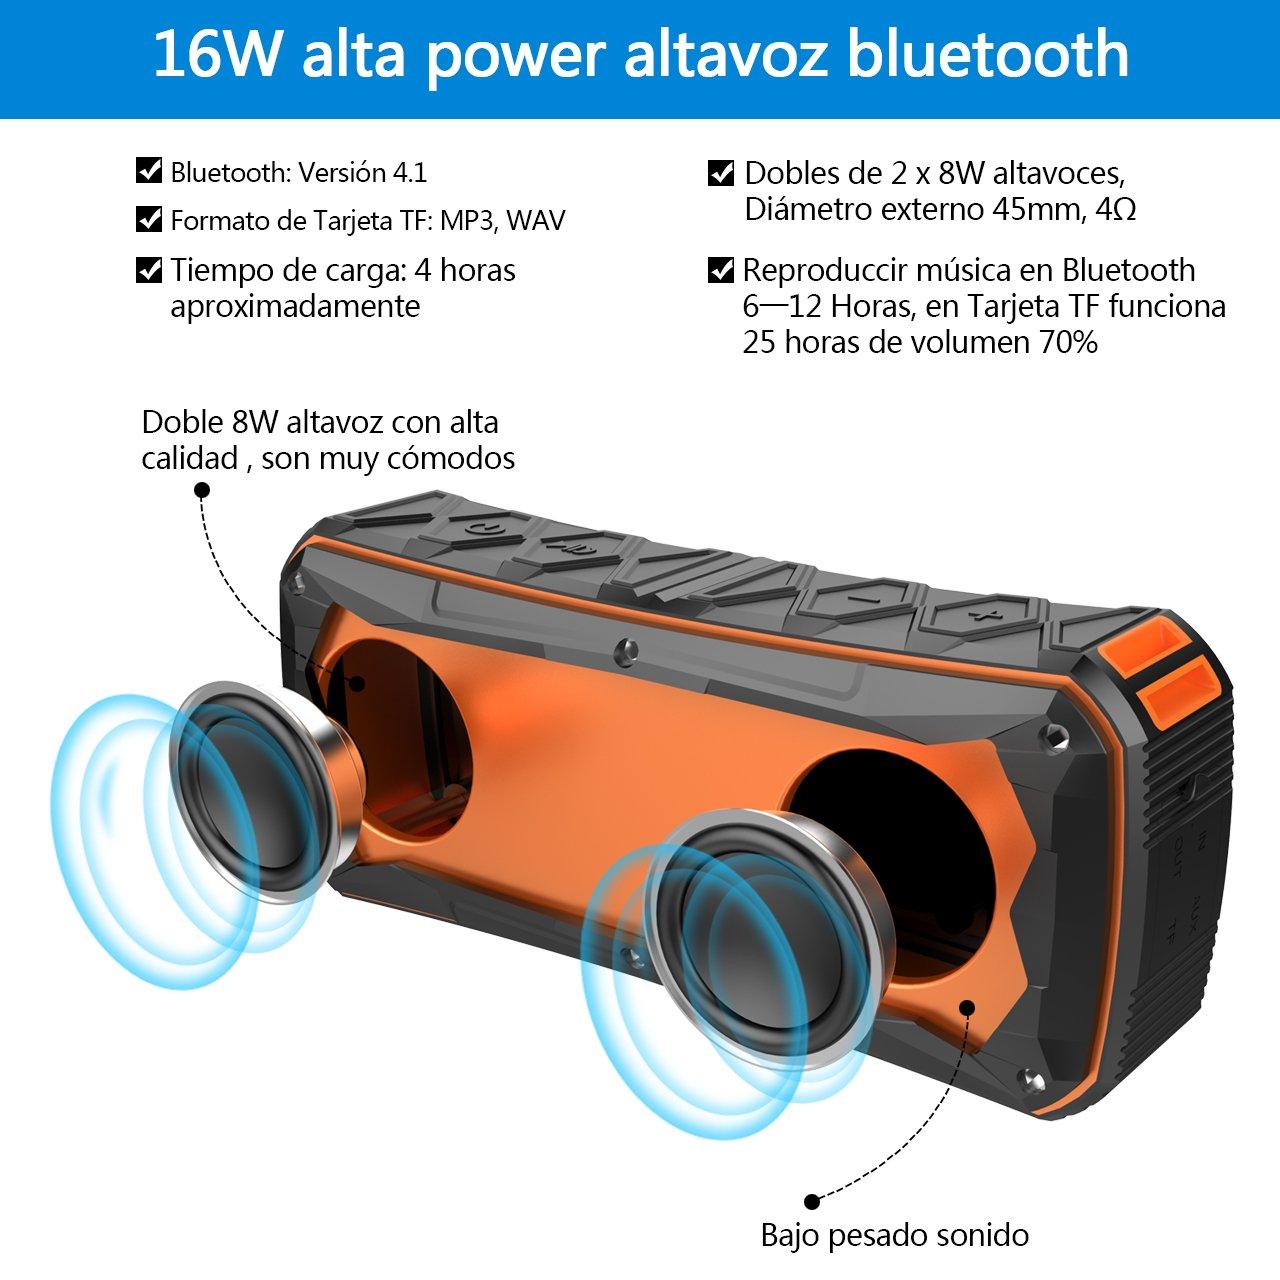 Altavoz Bluetooth Portátil 16W IPX6 Impermeable Estéreo Altavoces Inalámbrico Bajo Estupendo Bateía 4500mAh Altavoz Inalámbrico Portátil Llamadas Manos ...